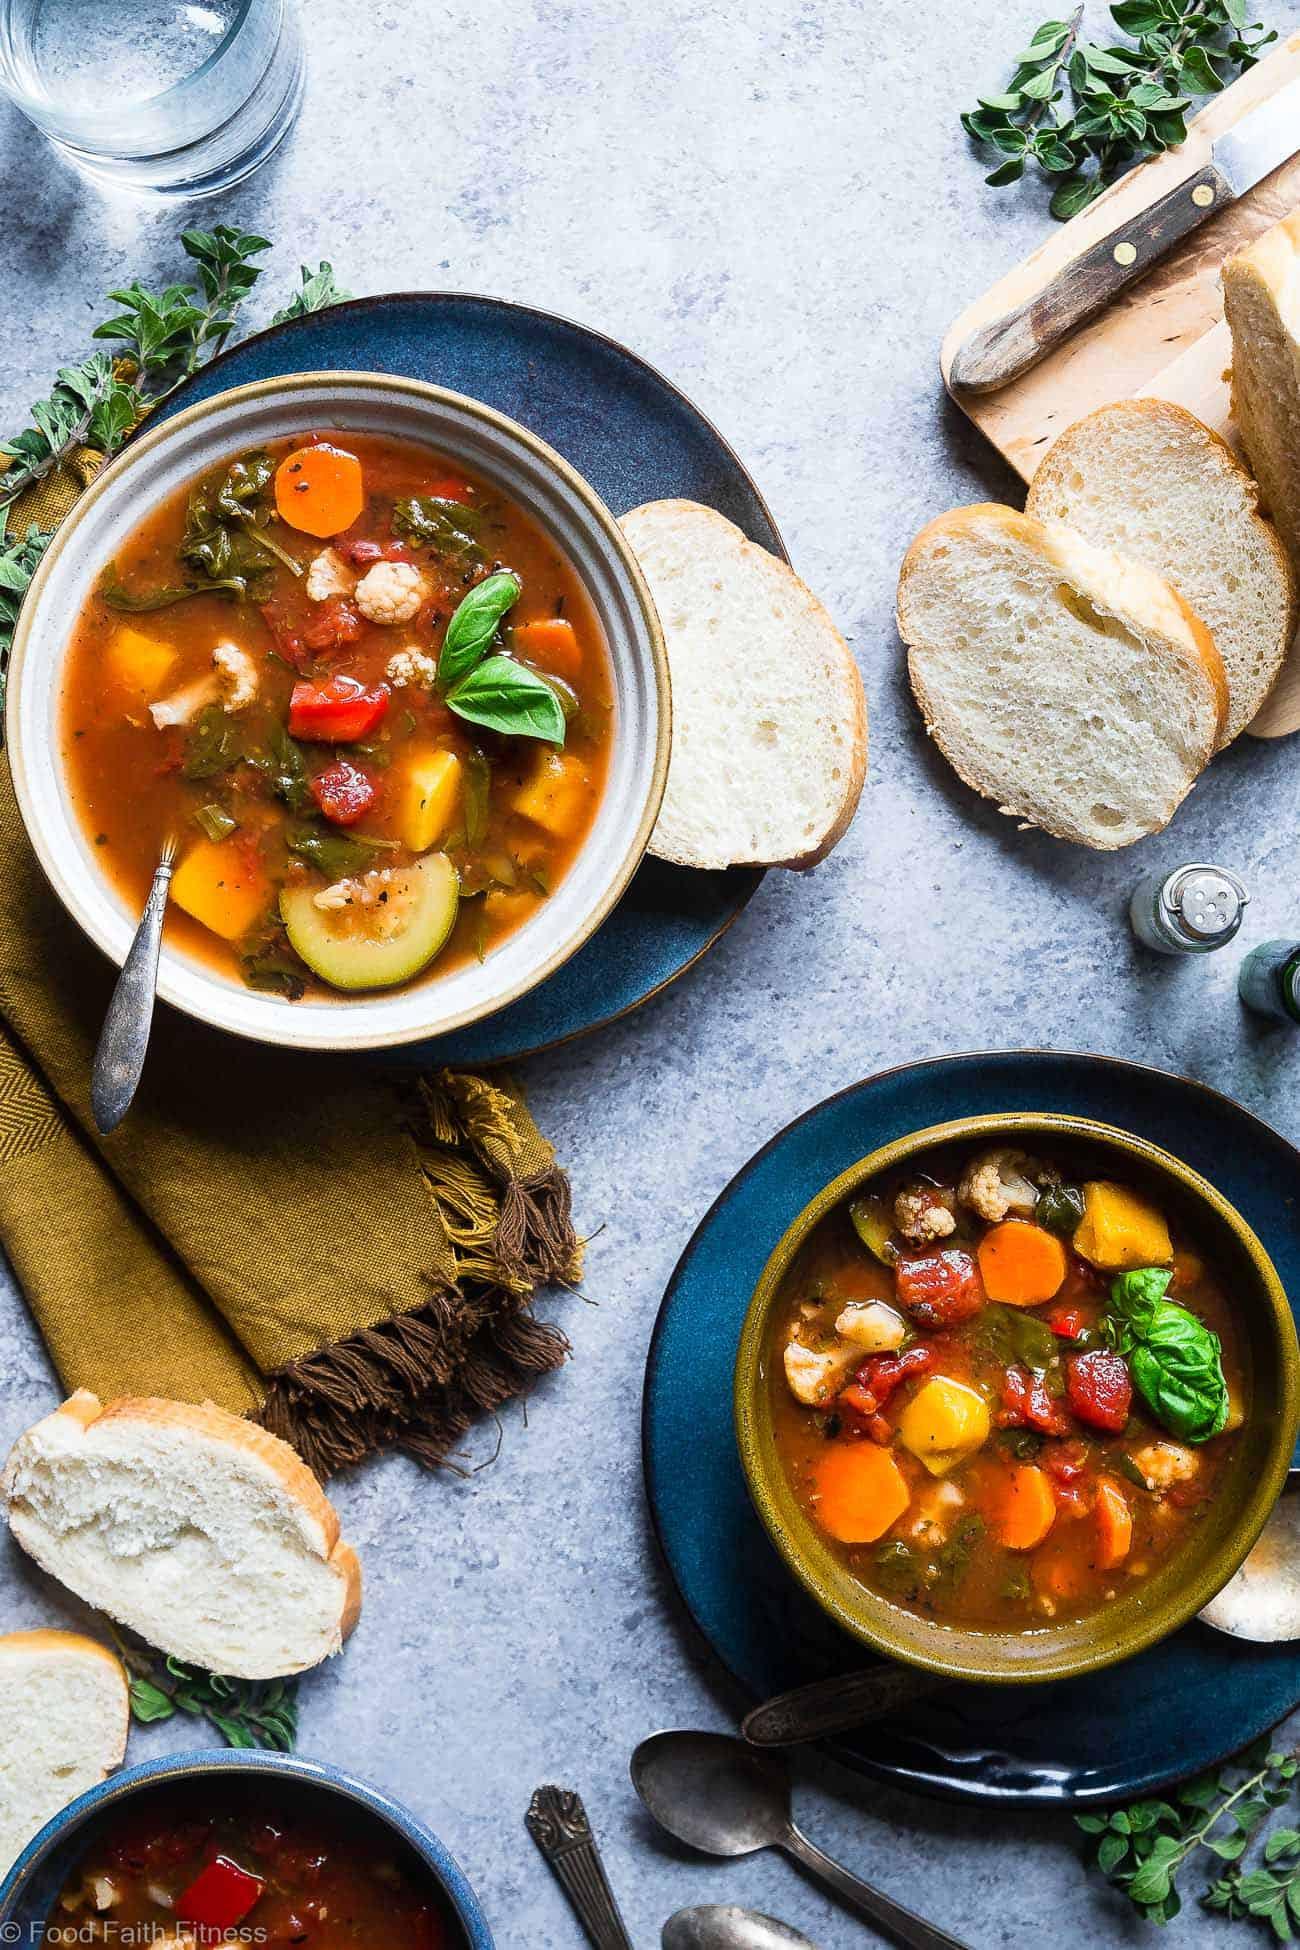 Easy Vegan Crockpot Recipes  Easy Homemade Crockpot Ve able Soup